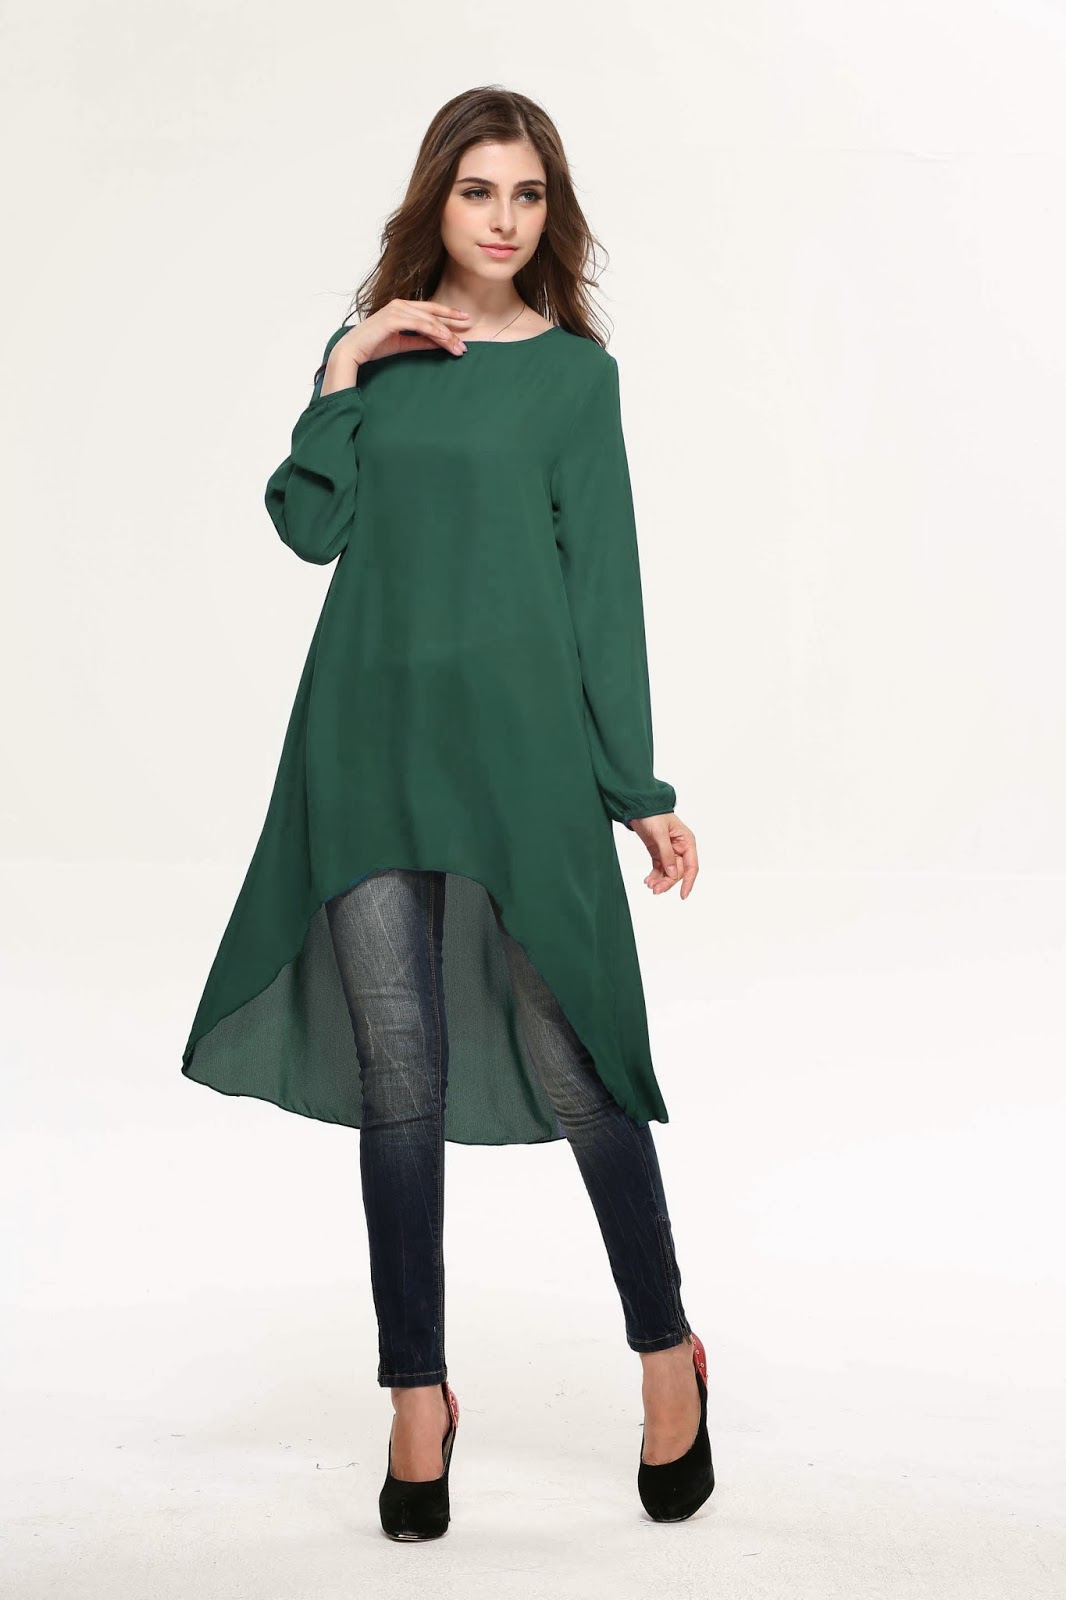 Infojelita Fesyen Blouse Terkini Korea Labuh For Sale | New Style for ...